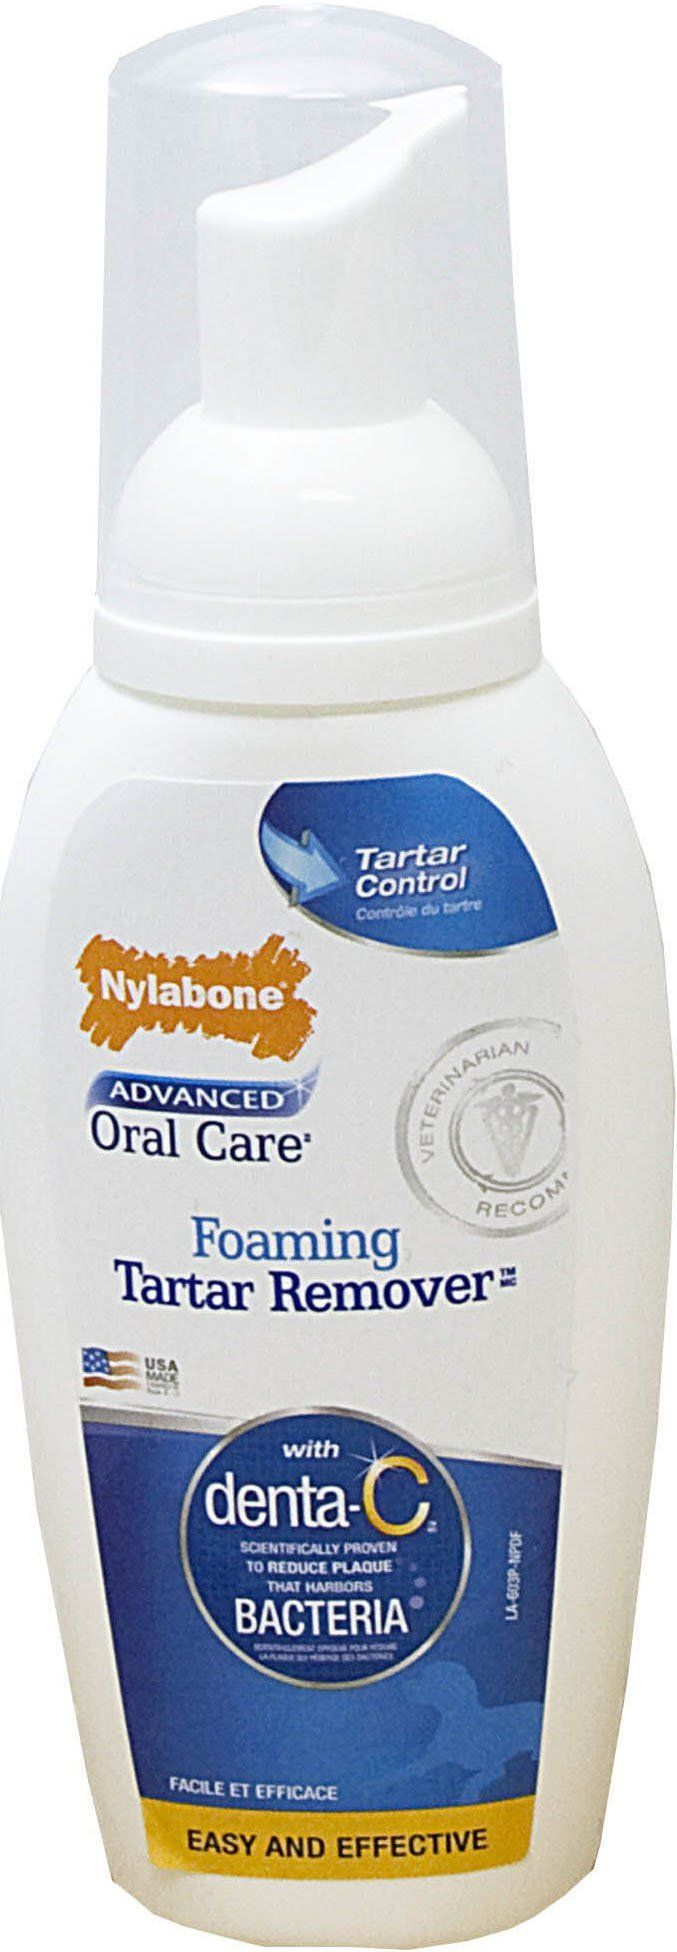 Nylabone Corp (bones) - Advanced Oral Care Foaming Tartar Remover